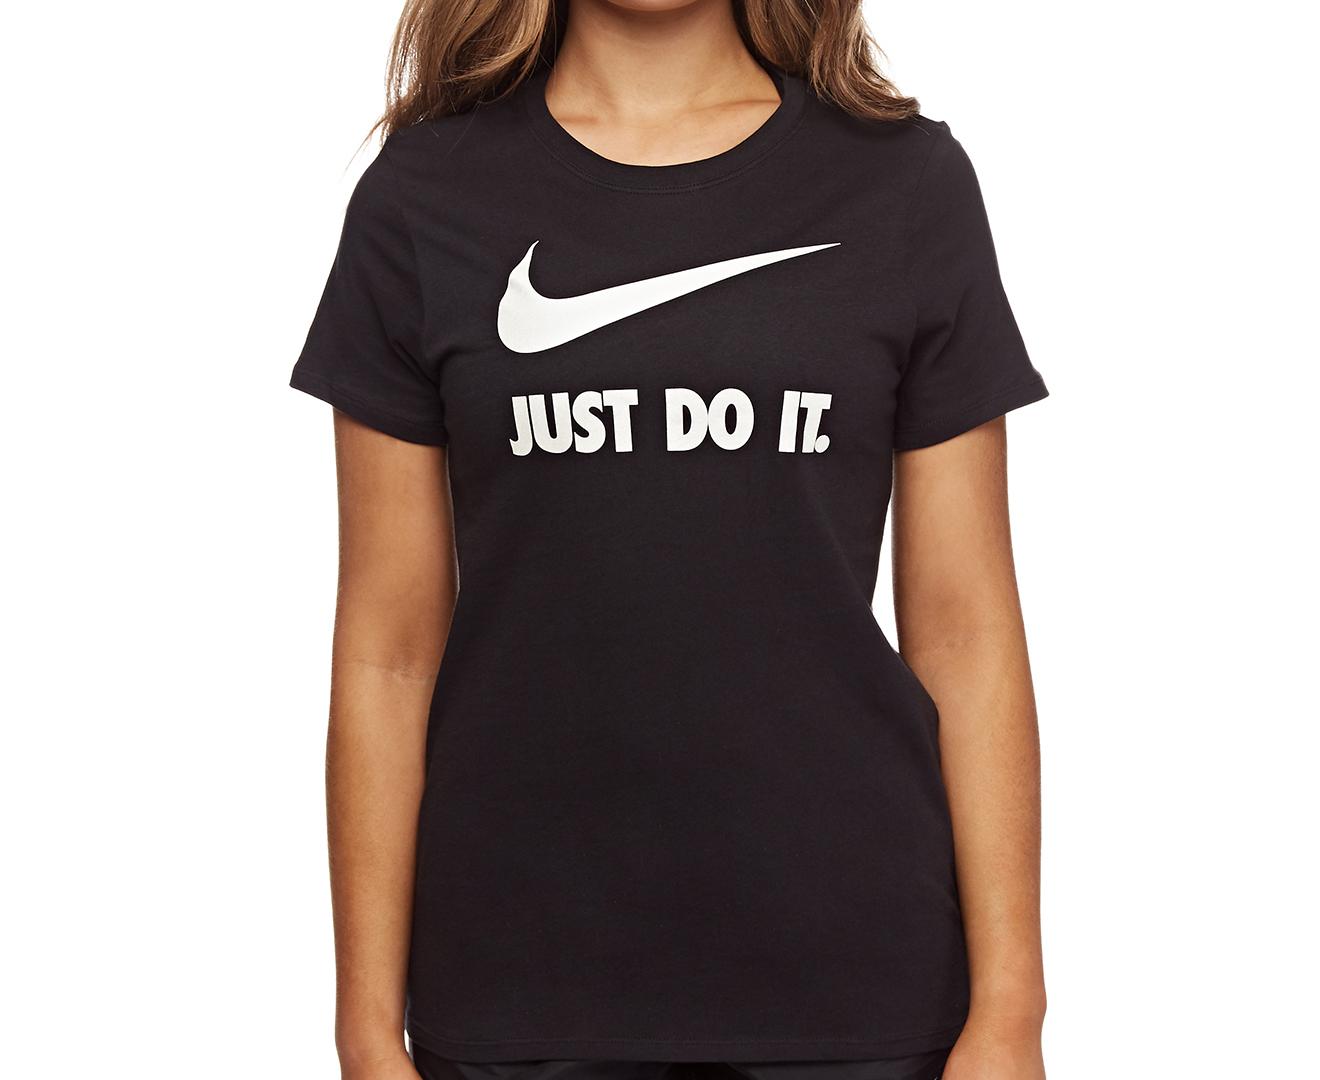 Nike women 39 s just do it swoosh crew tee black white for Nike just do it t shirt women s